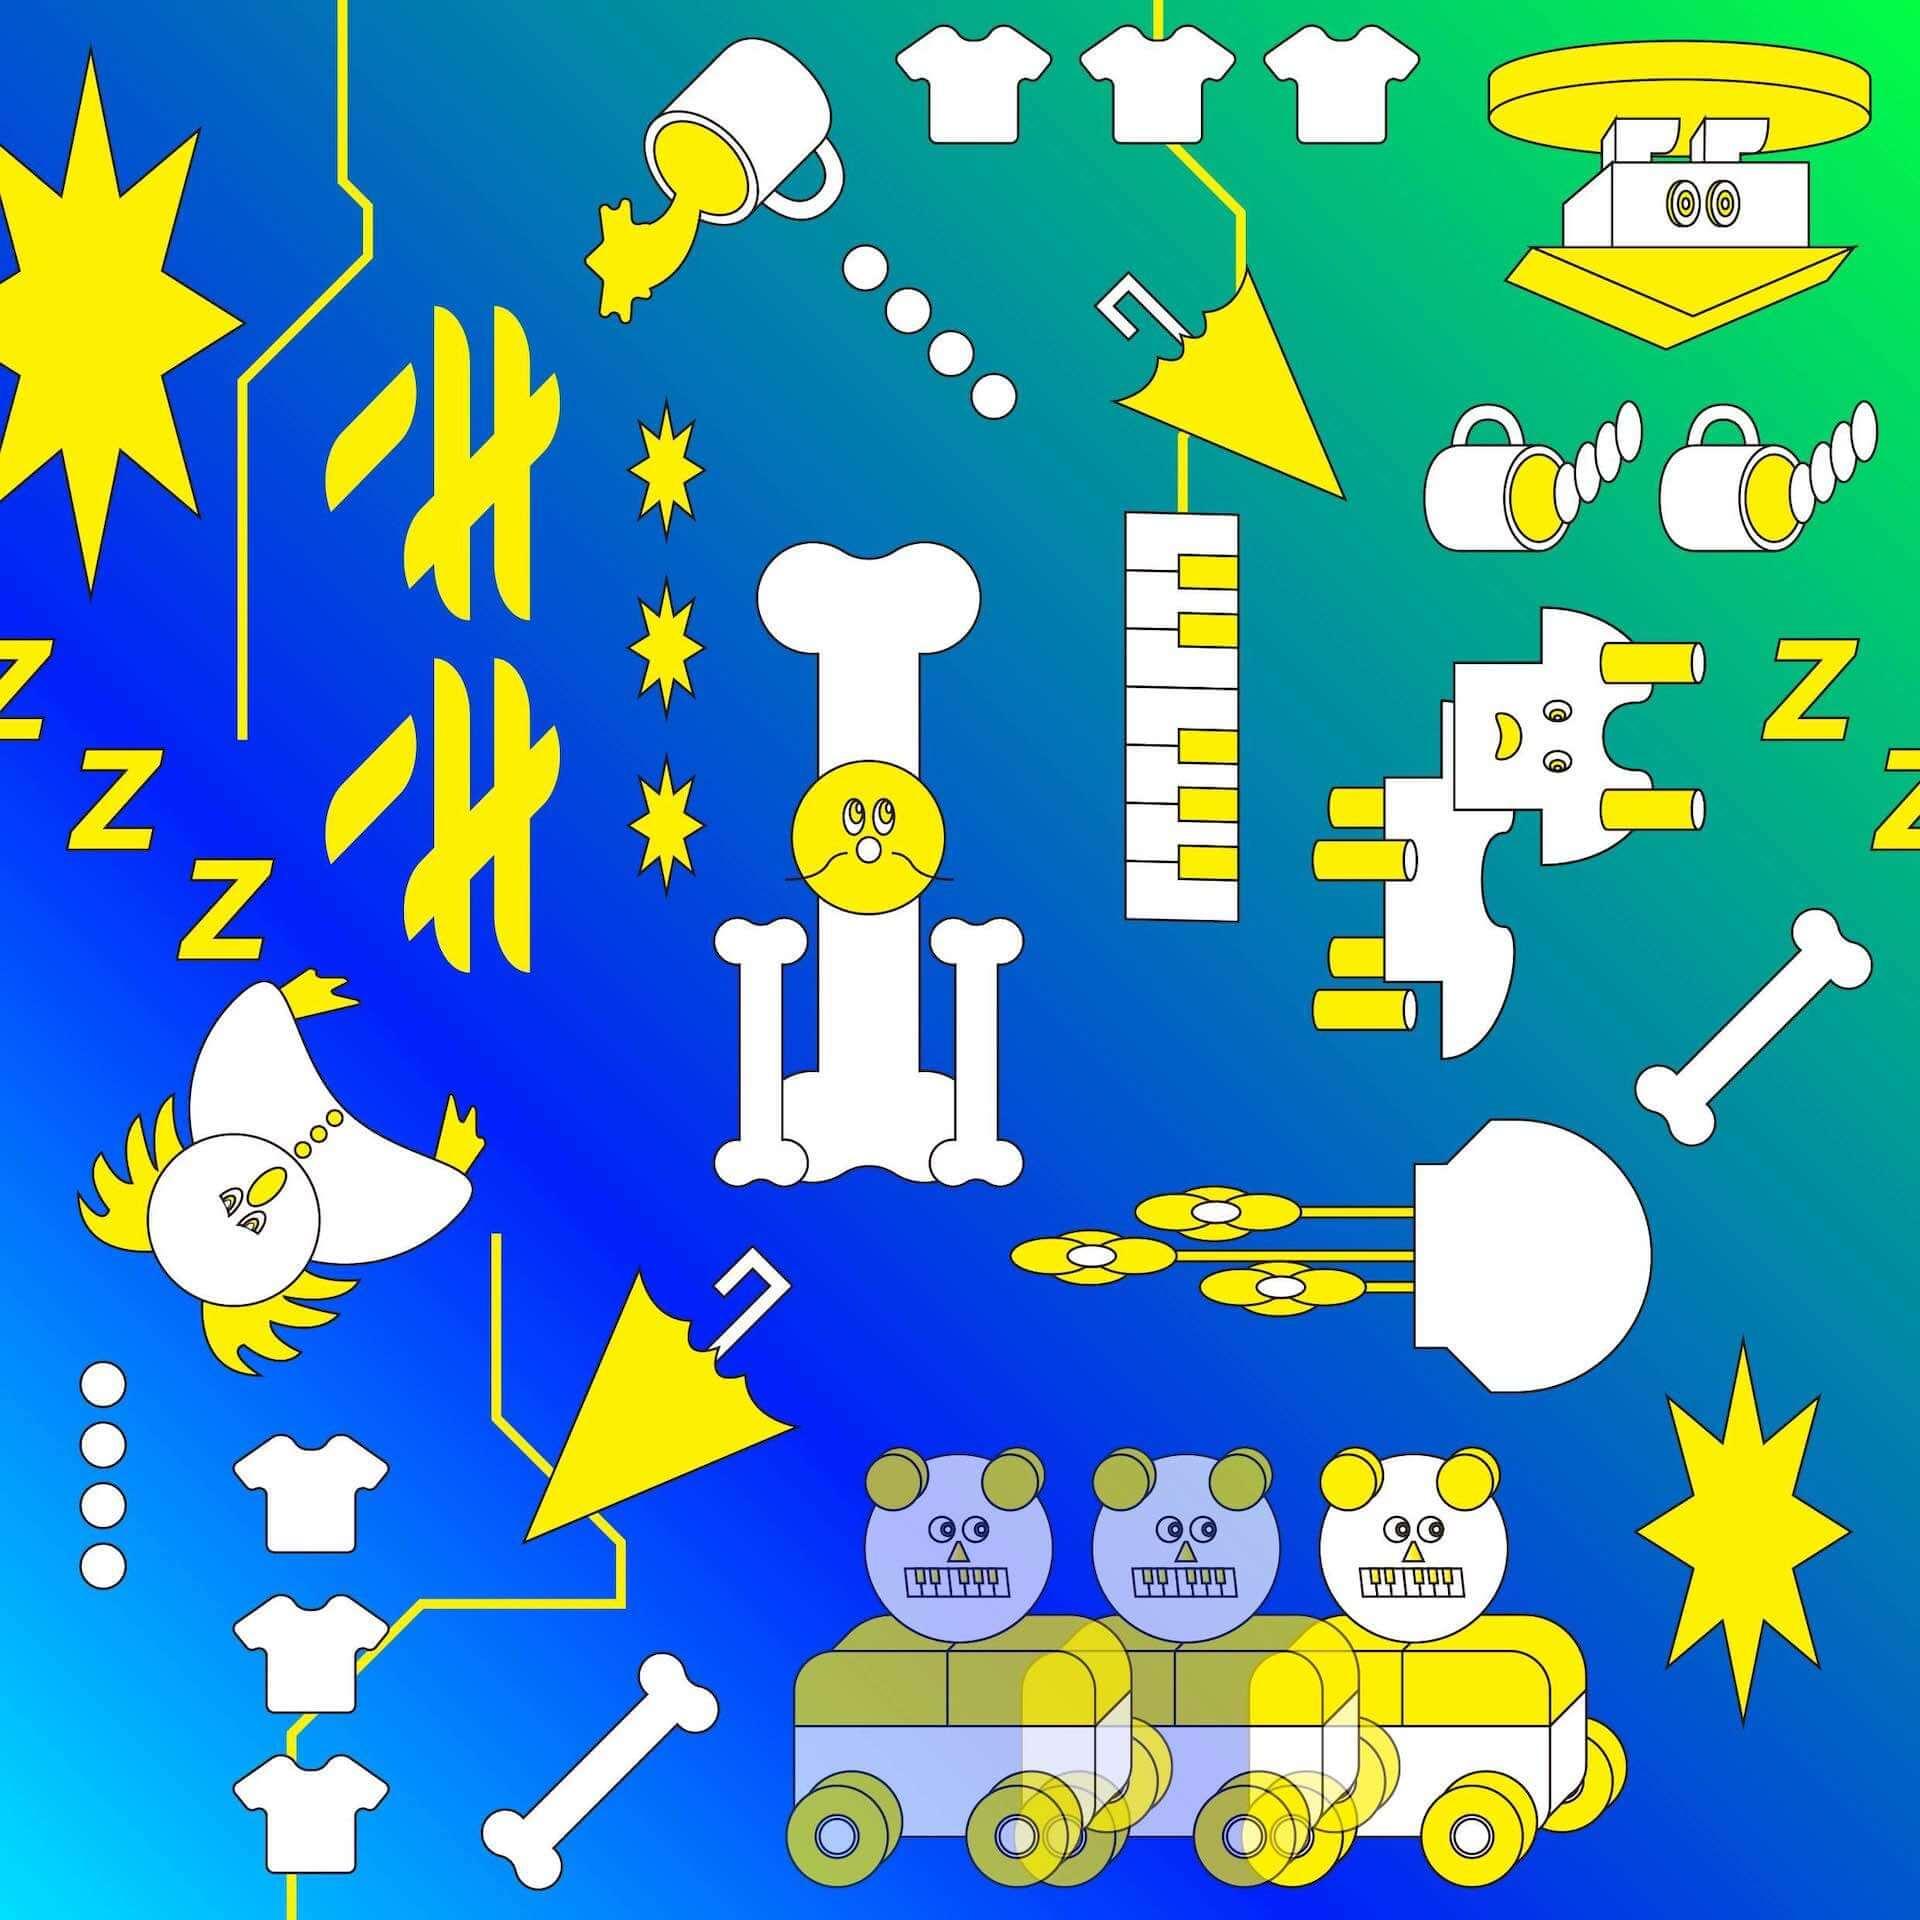 "xiangyuが2nd EP『きき』をデジタルリリース&新曲""BBIISPP""のMVを公開!自主企画<香魚荘#02>も開催決定 music200605_xiangyu_mv_02-1920x1920"